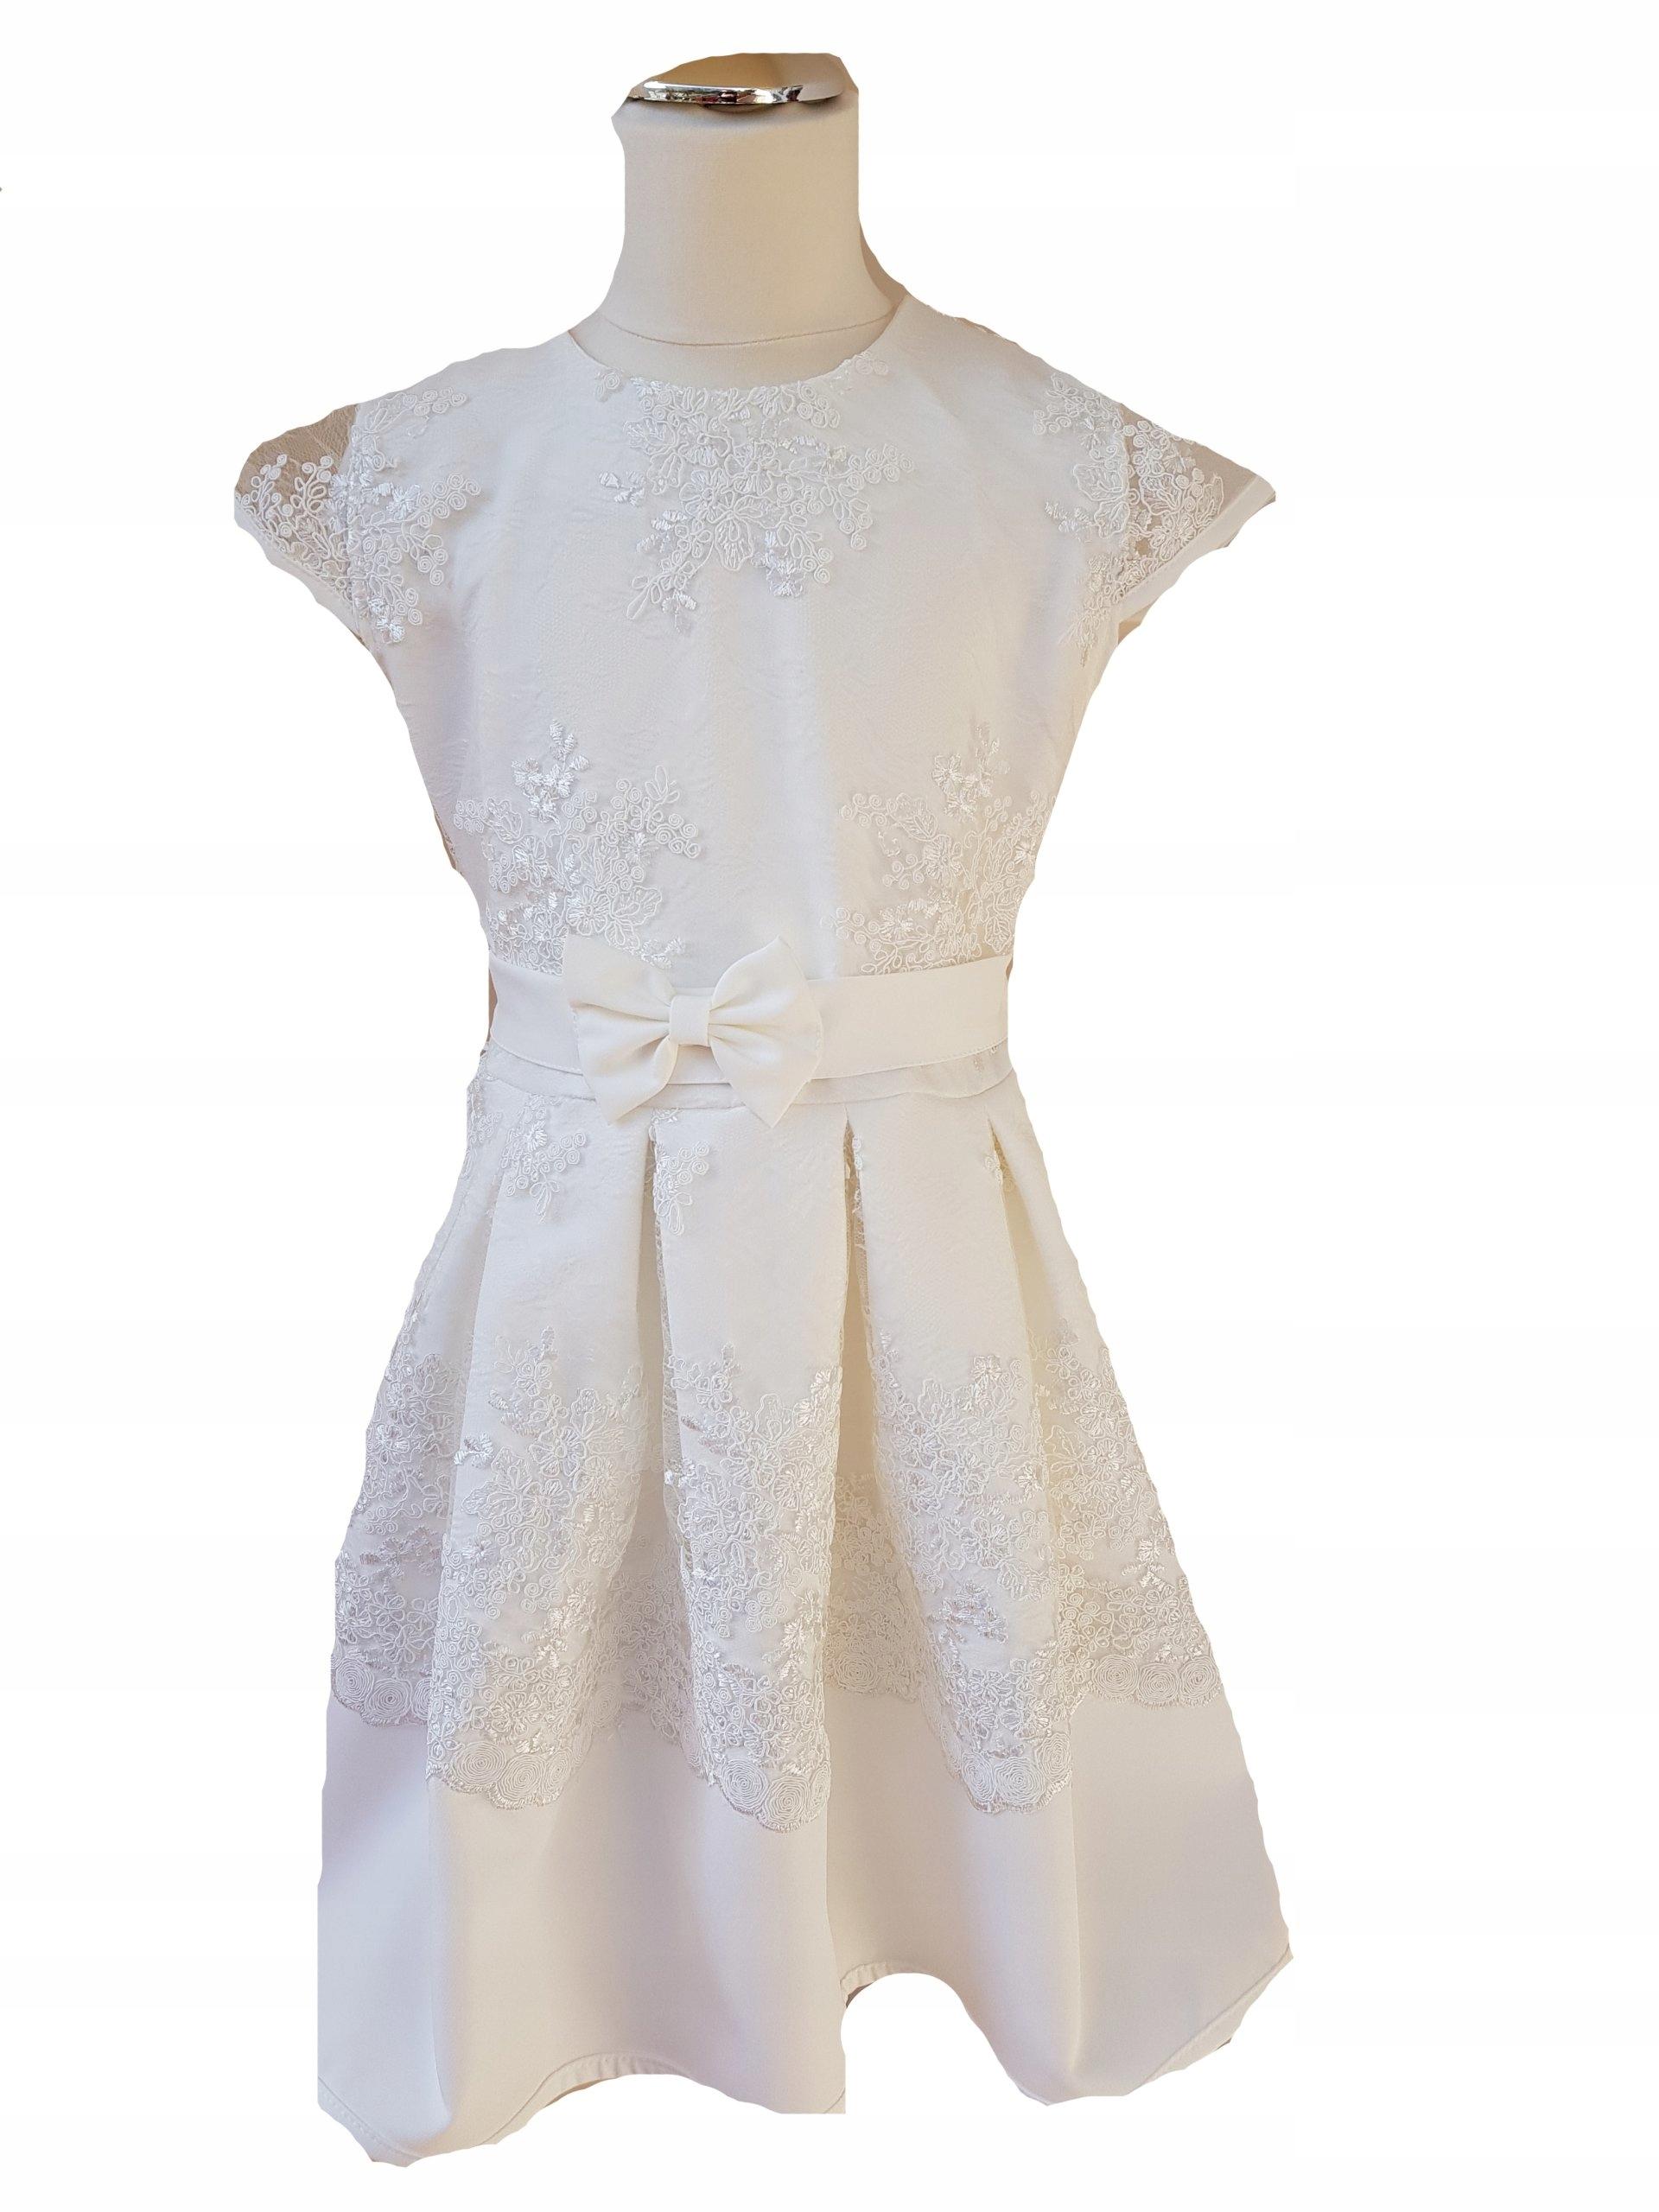 15e37de4 Sukienka elegancka ecru na wesele 152 - 7405546451 - oficjalne ...